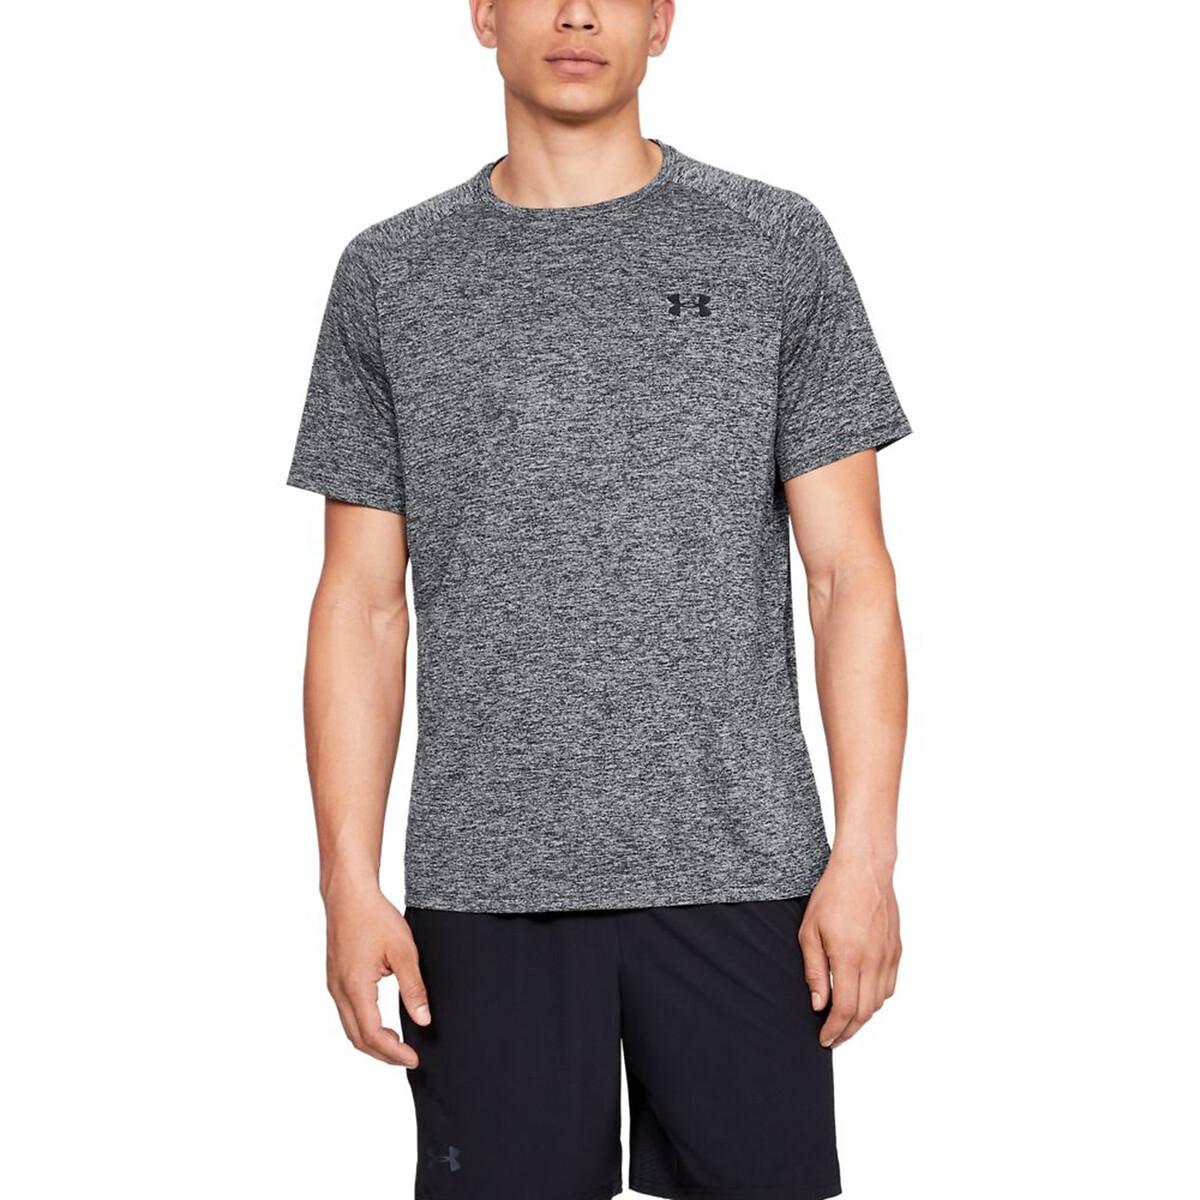 T-shirt Tech de gola redonda, mangas curtas